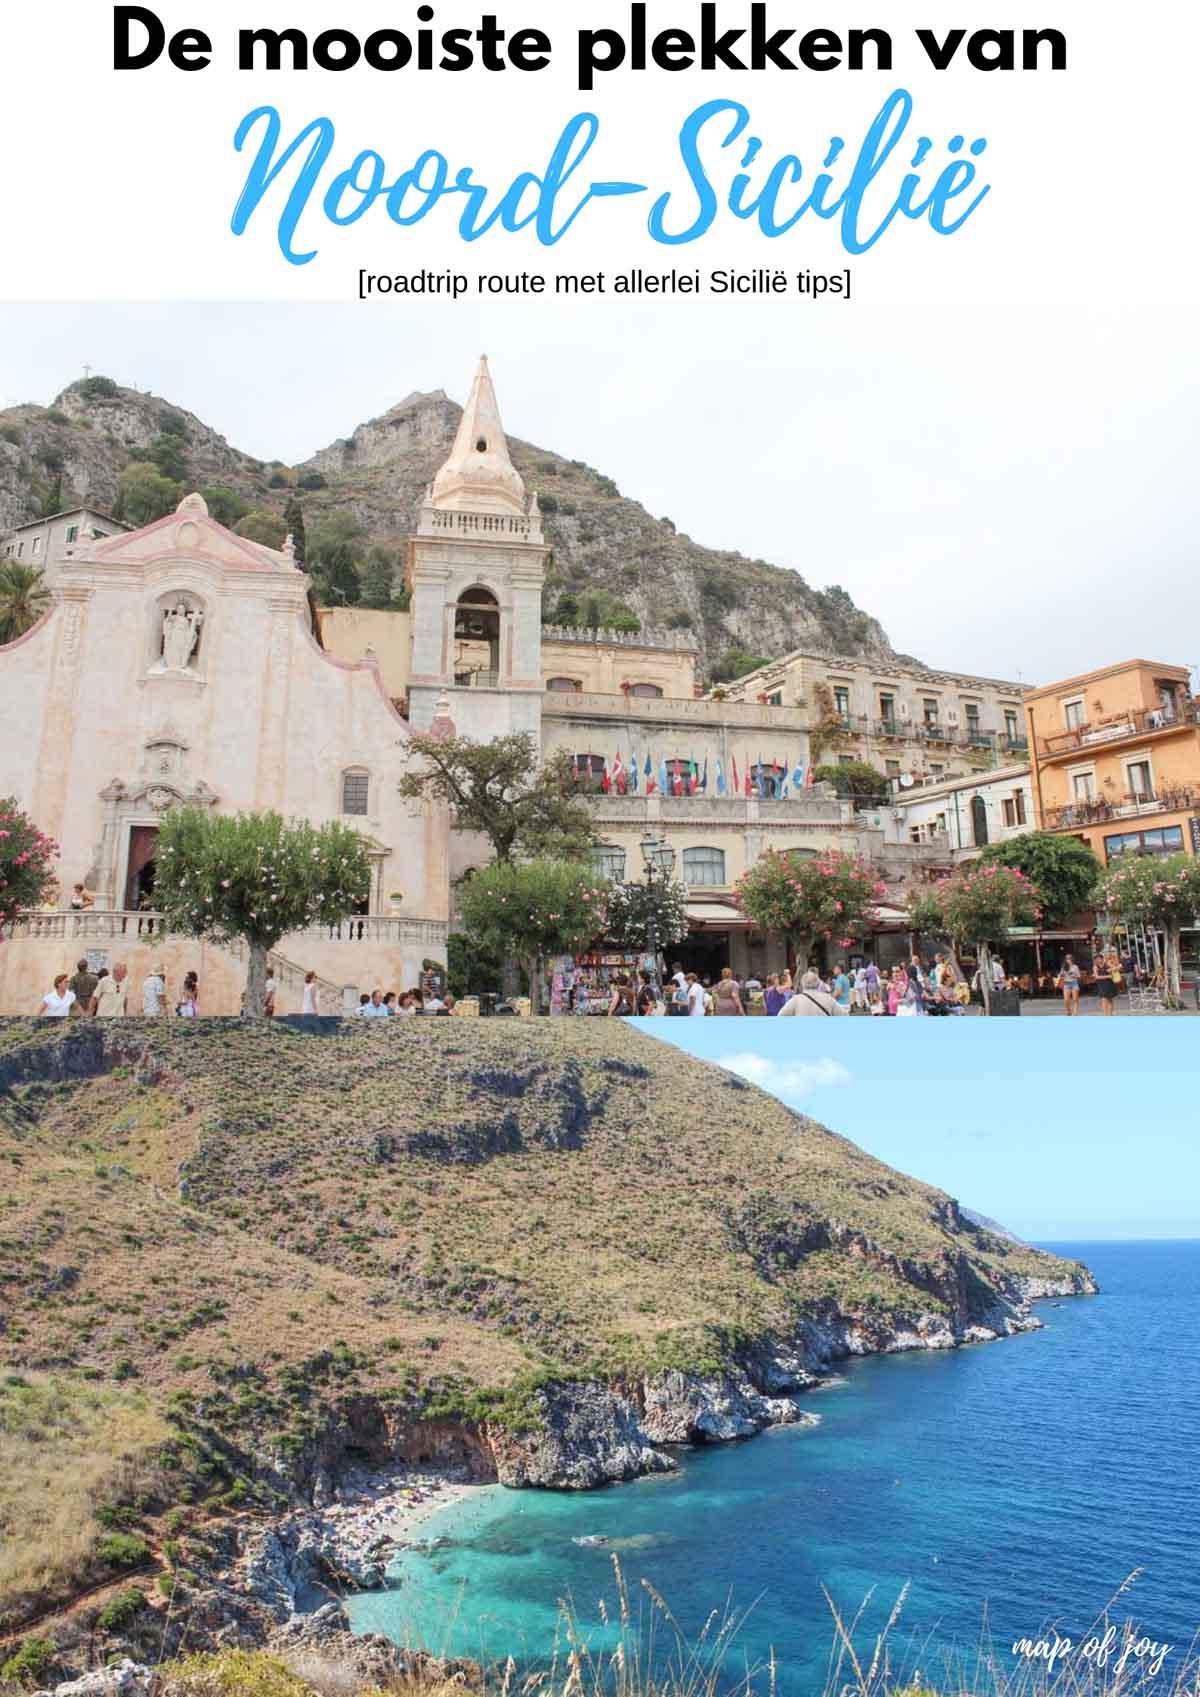 De mooiste plekken van Noord-Sicilië [roadtrip route] - Map of Joy